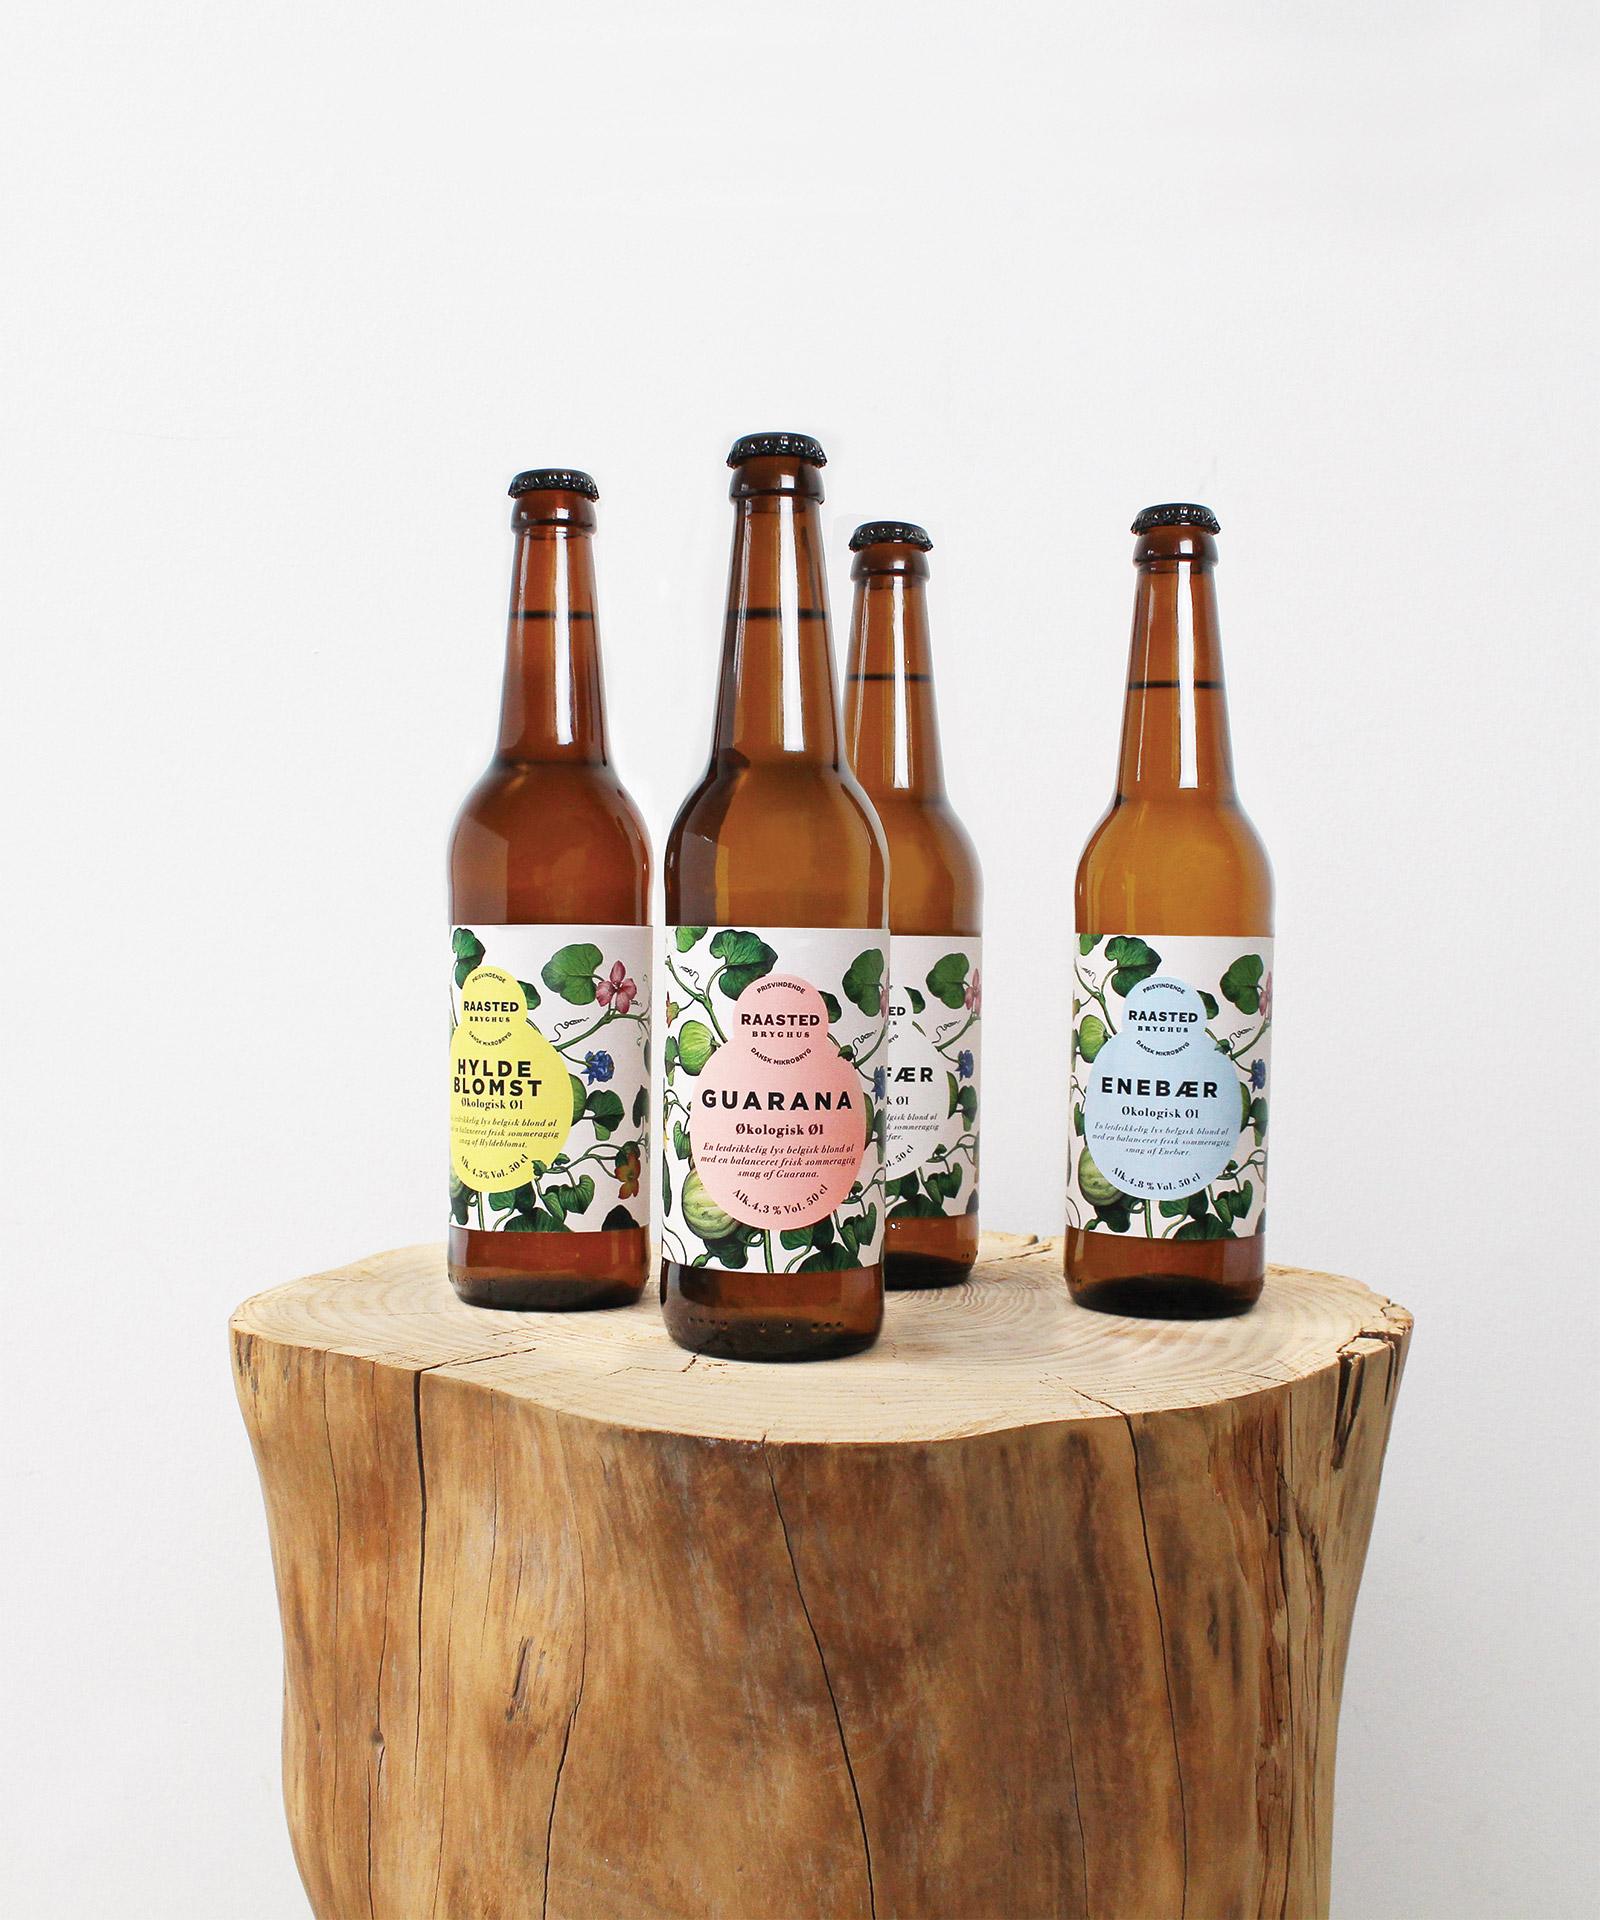 RAASTED ORGANIC — The poetry of beer craft